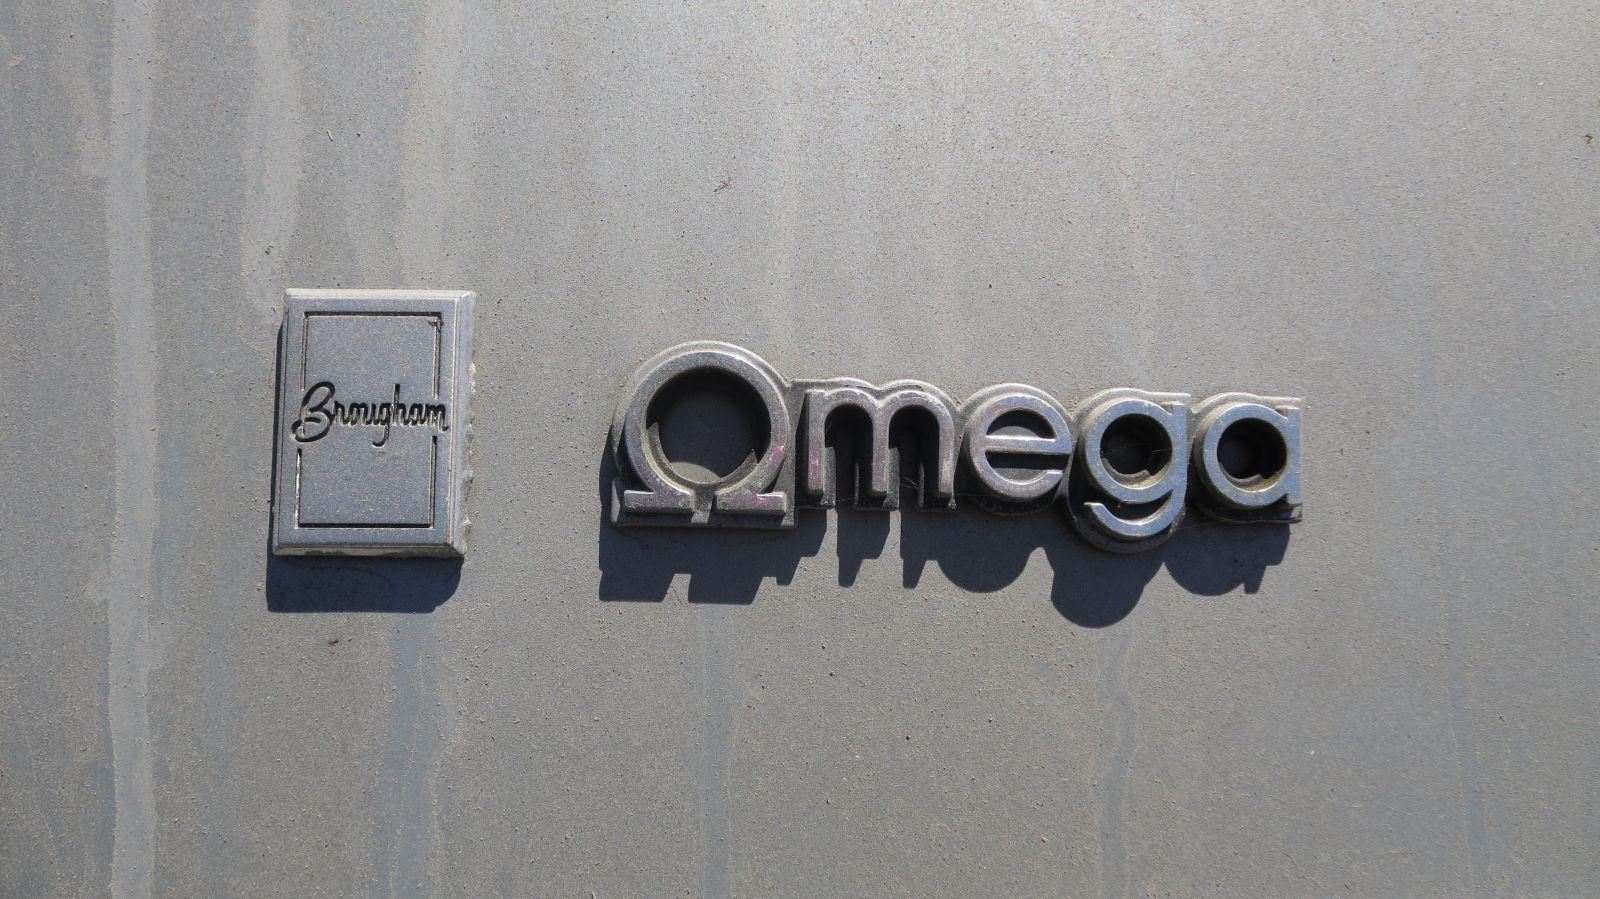 1984 Oldsmobile Omega Brougham in California wrecking yard